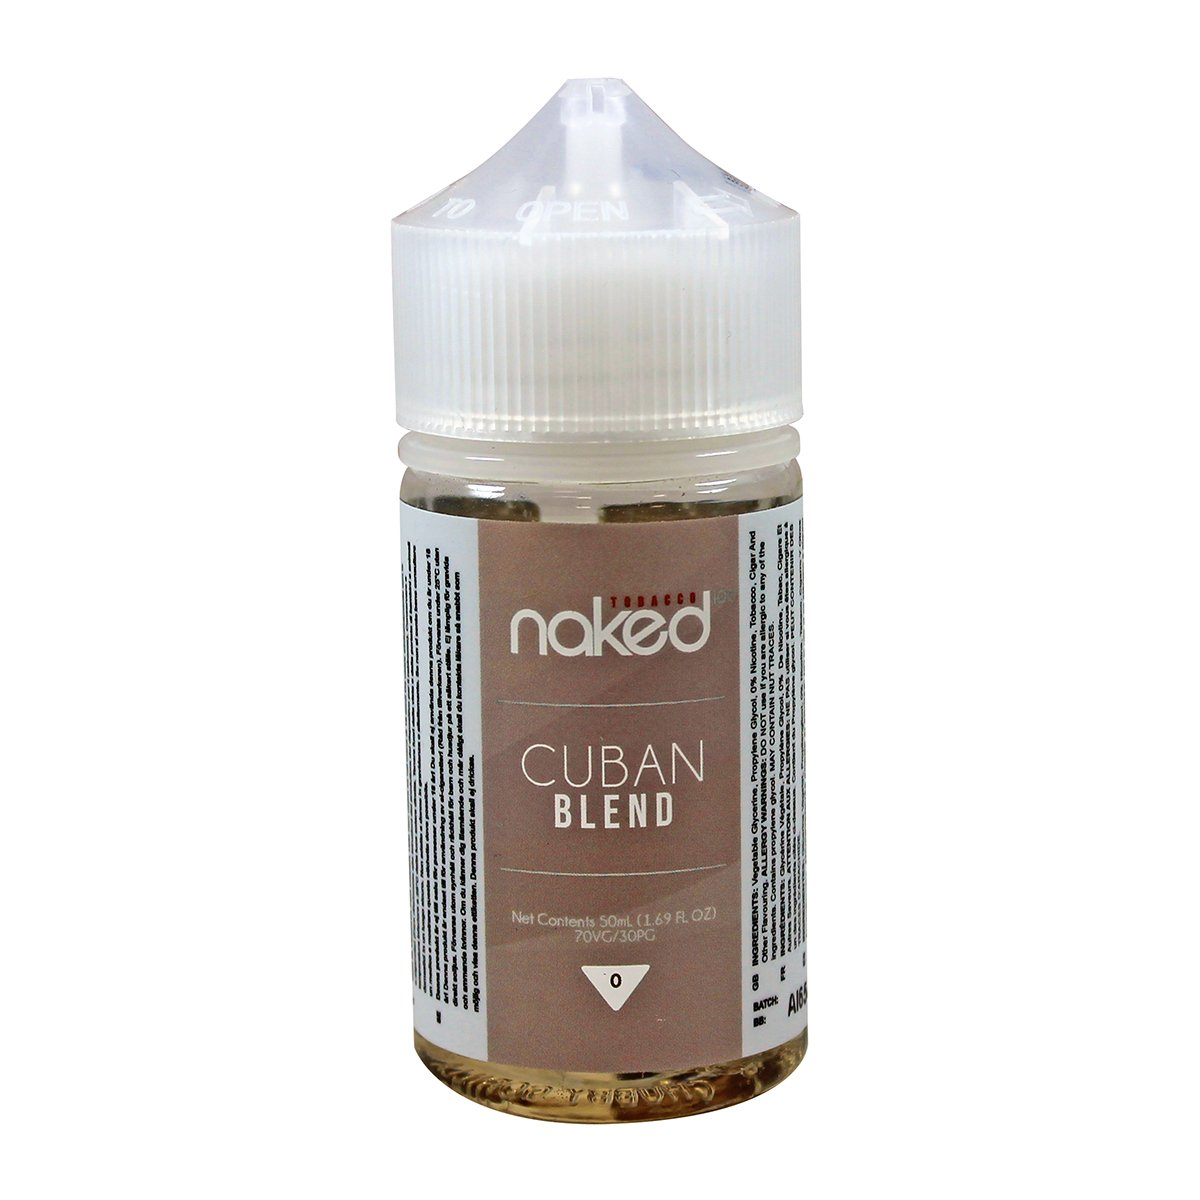 Cuban Blend Tobacco by Naked 100 60ml ⋆ VapeSocietySupply